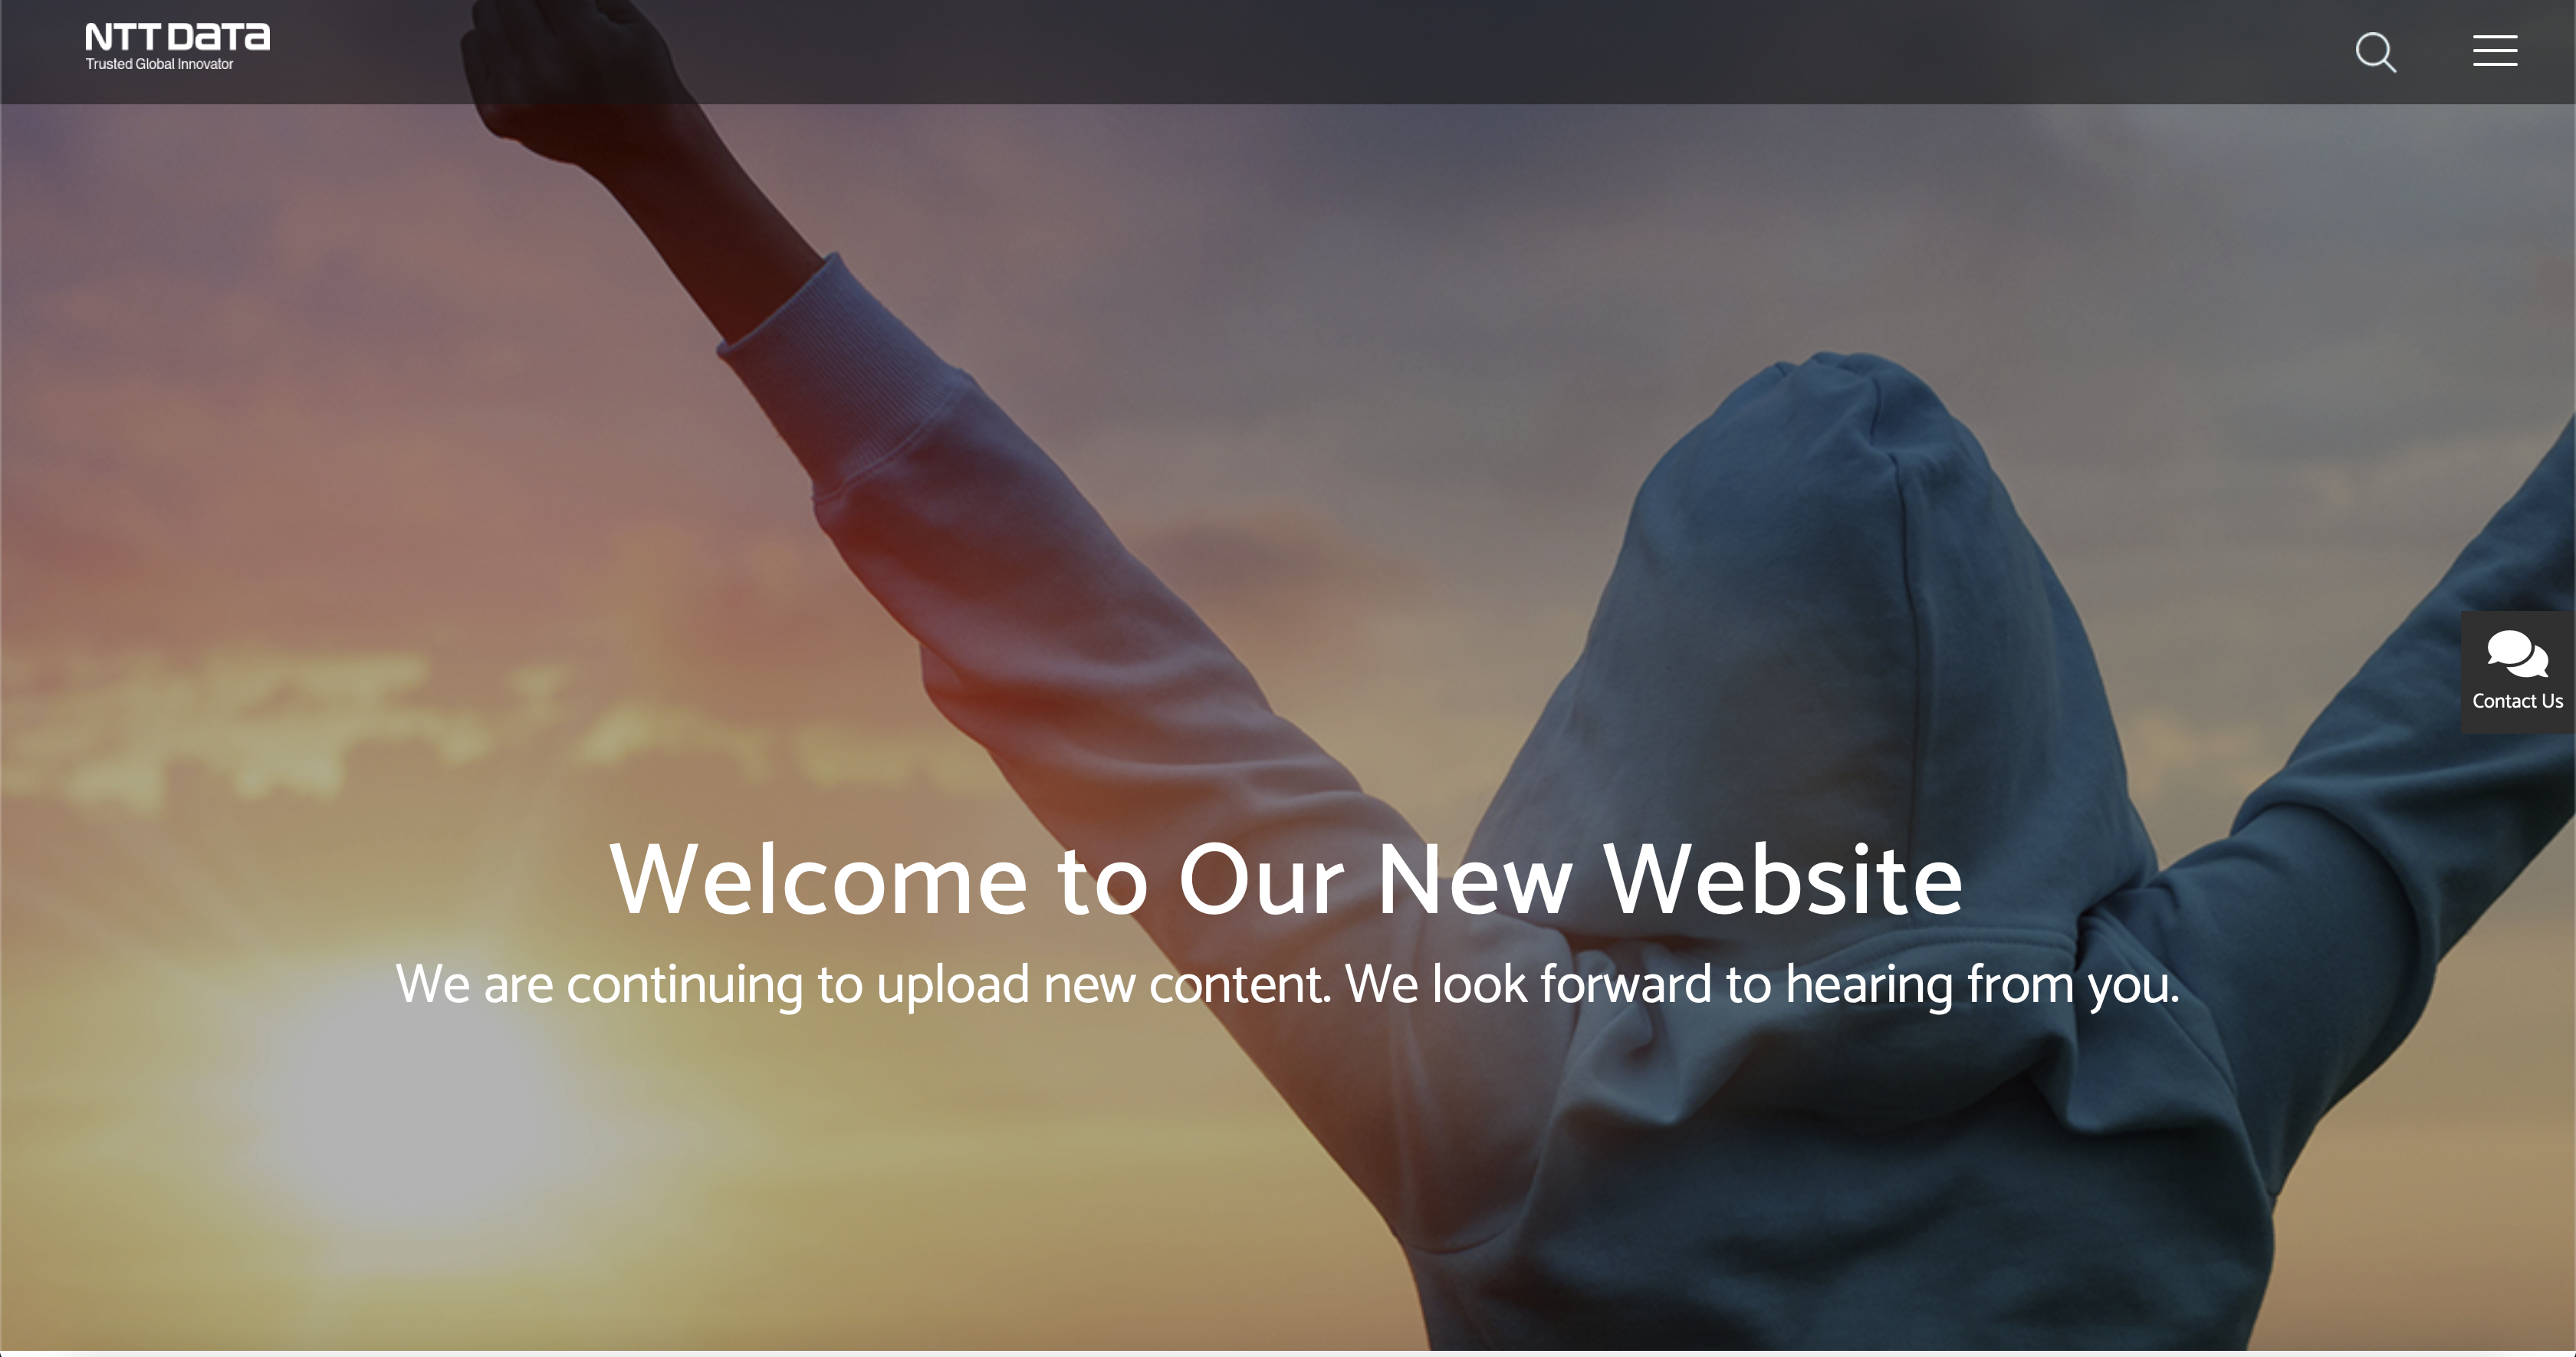 NTT DATA Business Solutions website India screenshot homepage